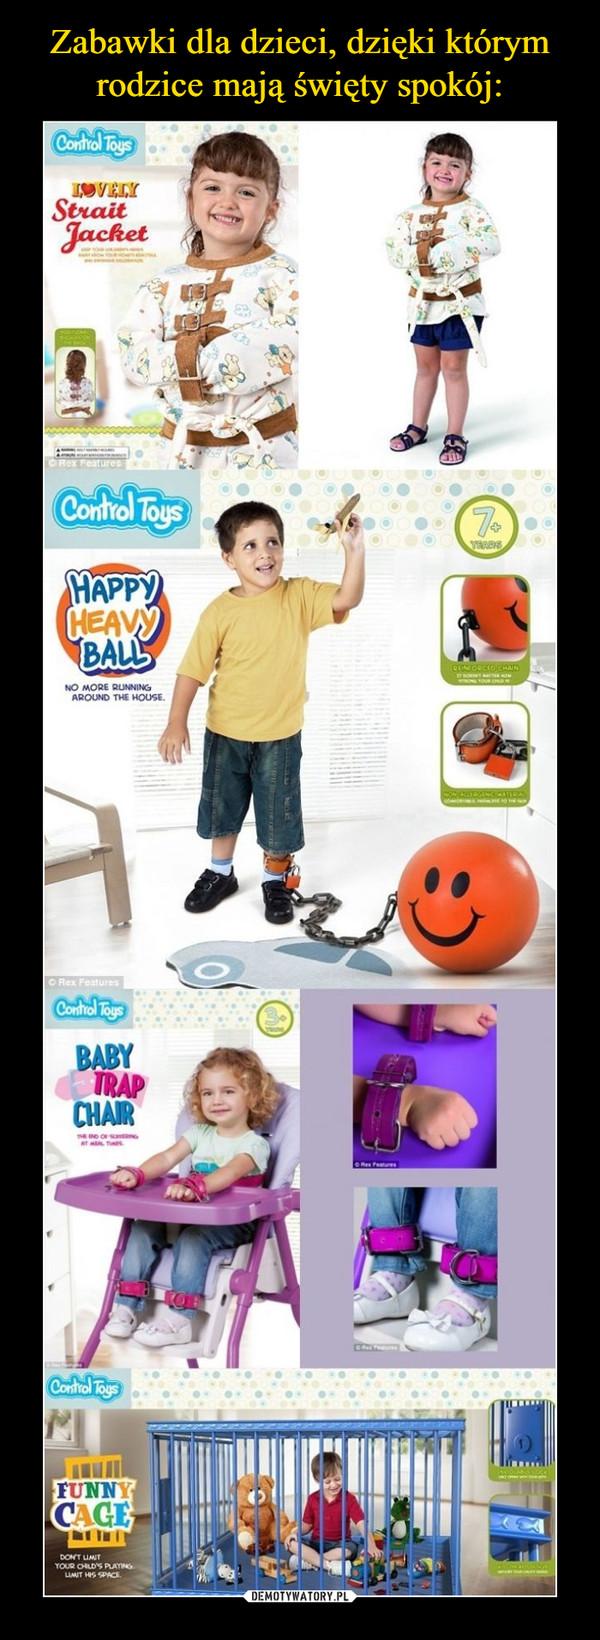 –  Happy heavy ball Baby trap chair